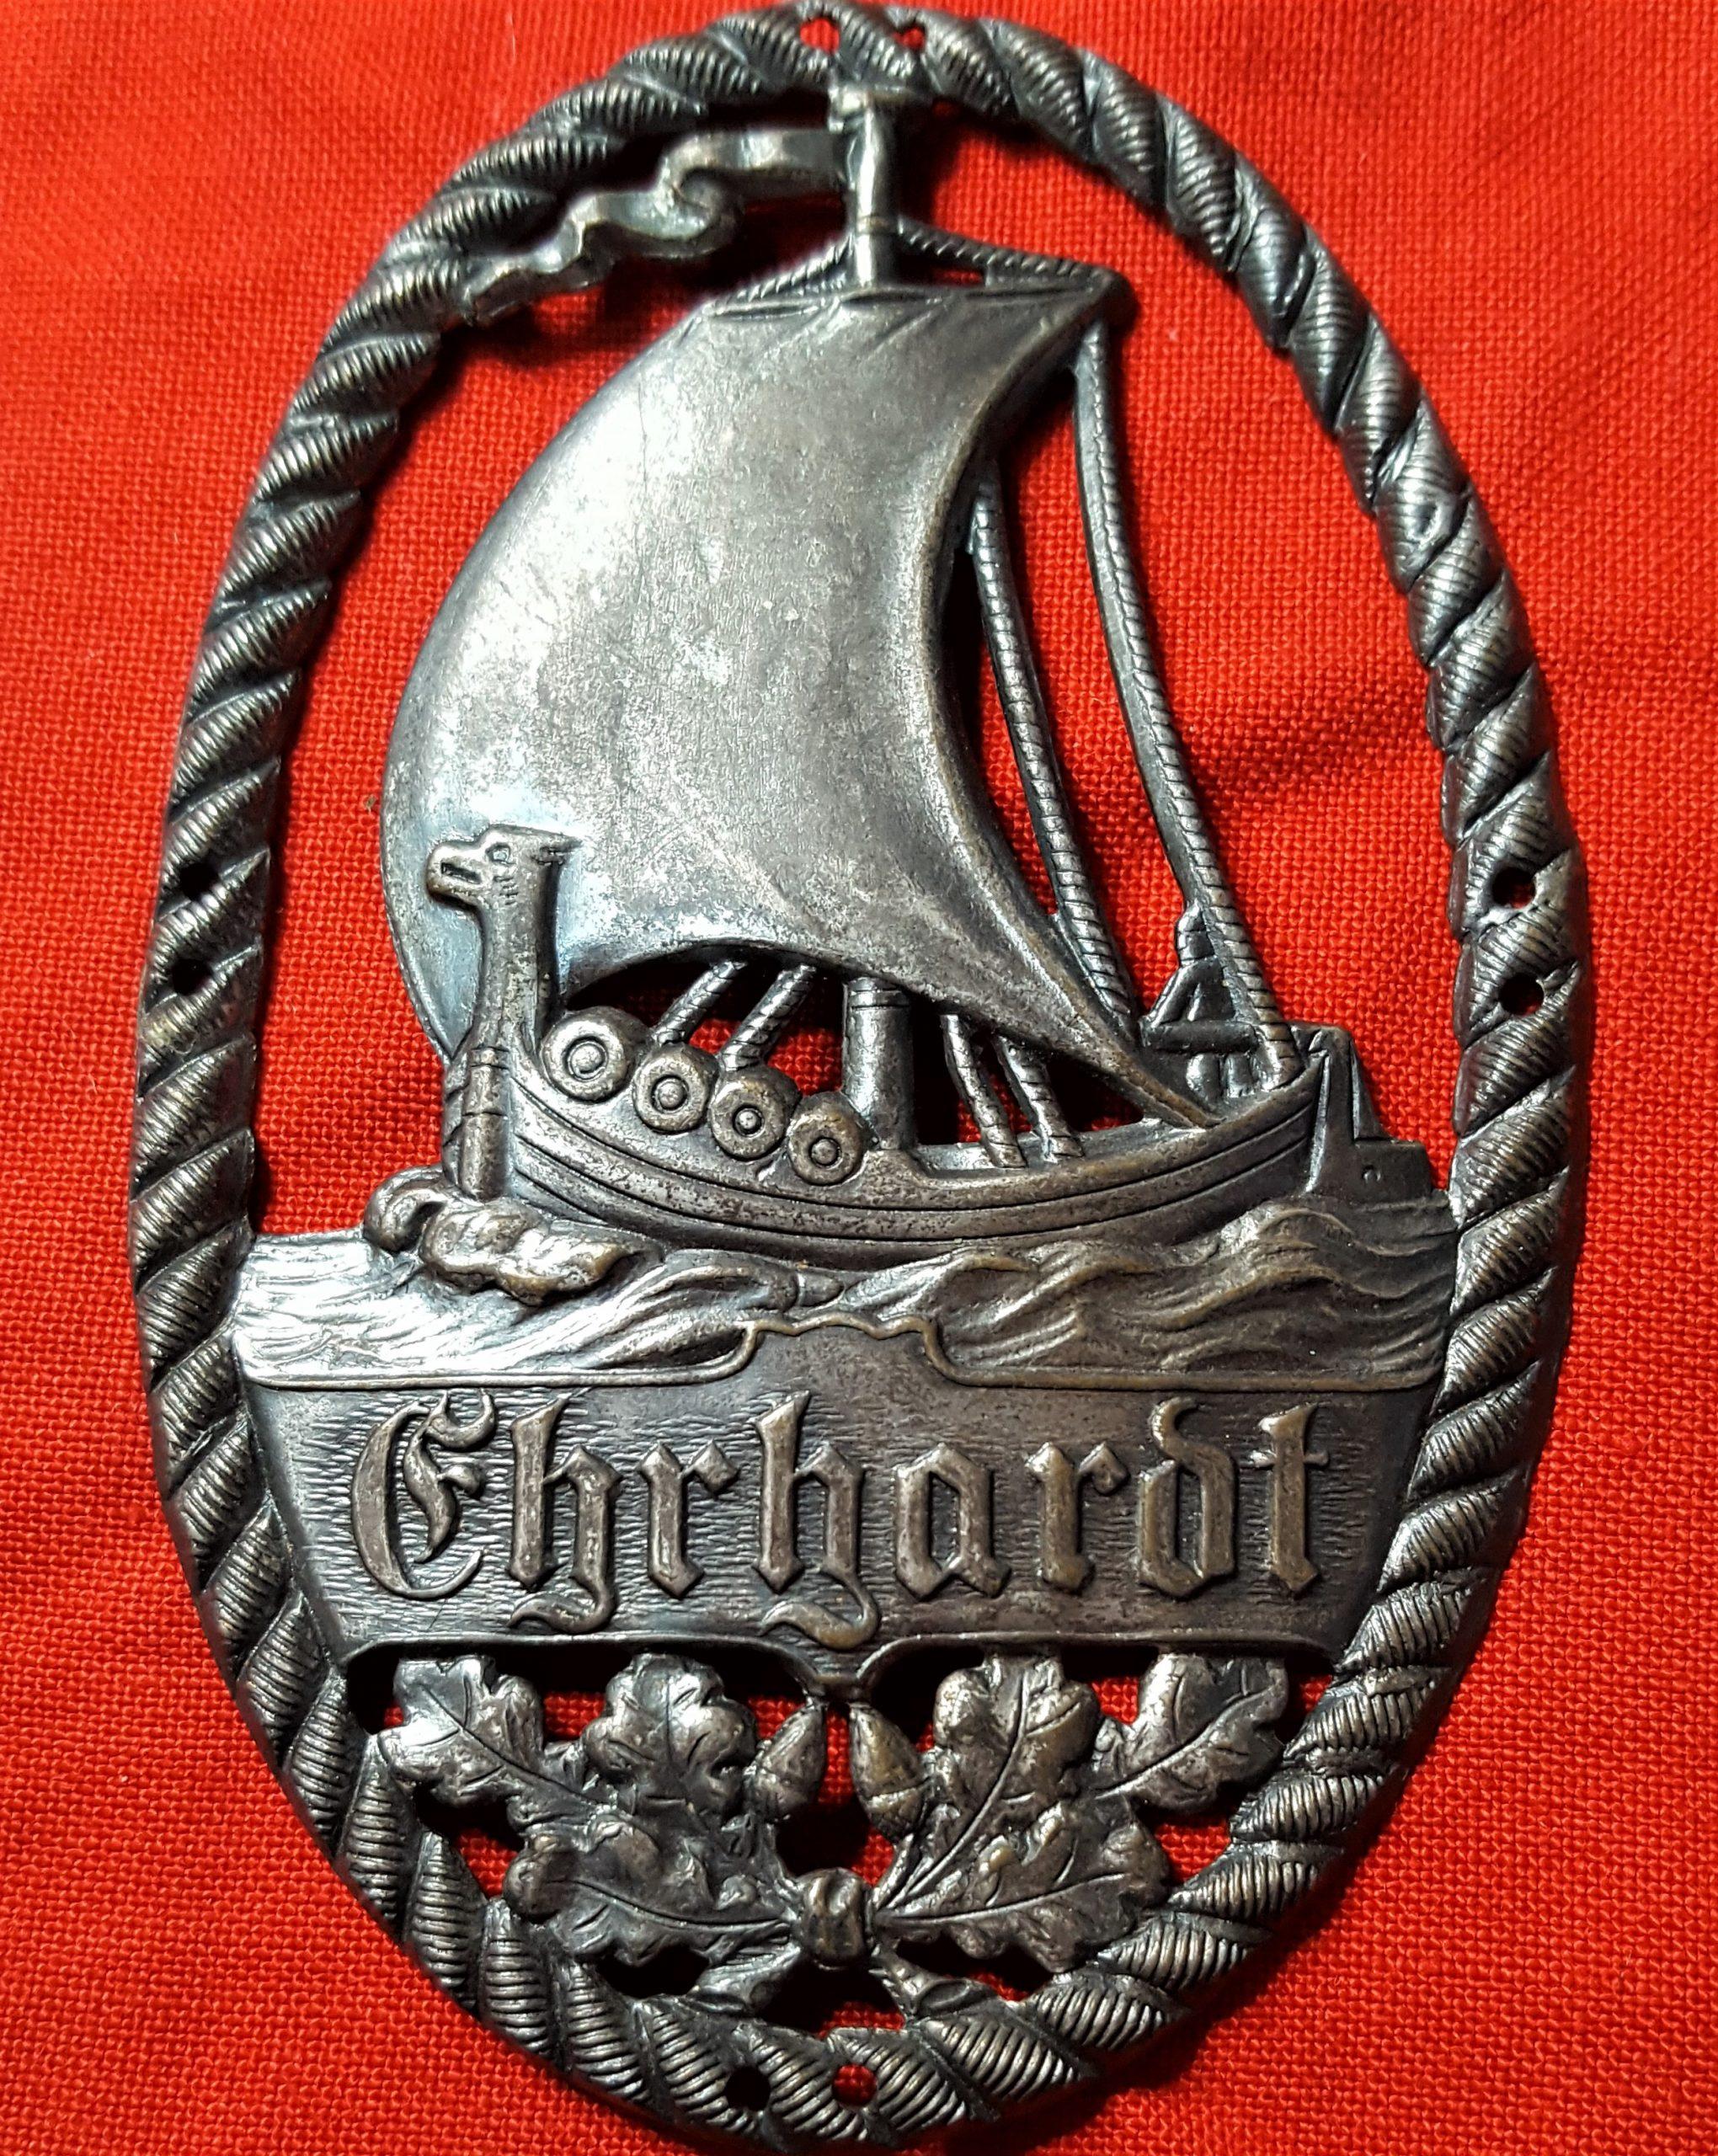 Immediate post WW1 era German Freikorps 'Ehardt Brigade' members uniform sleeve badge